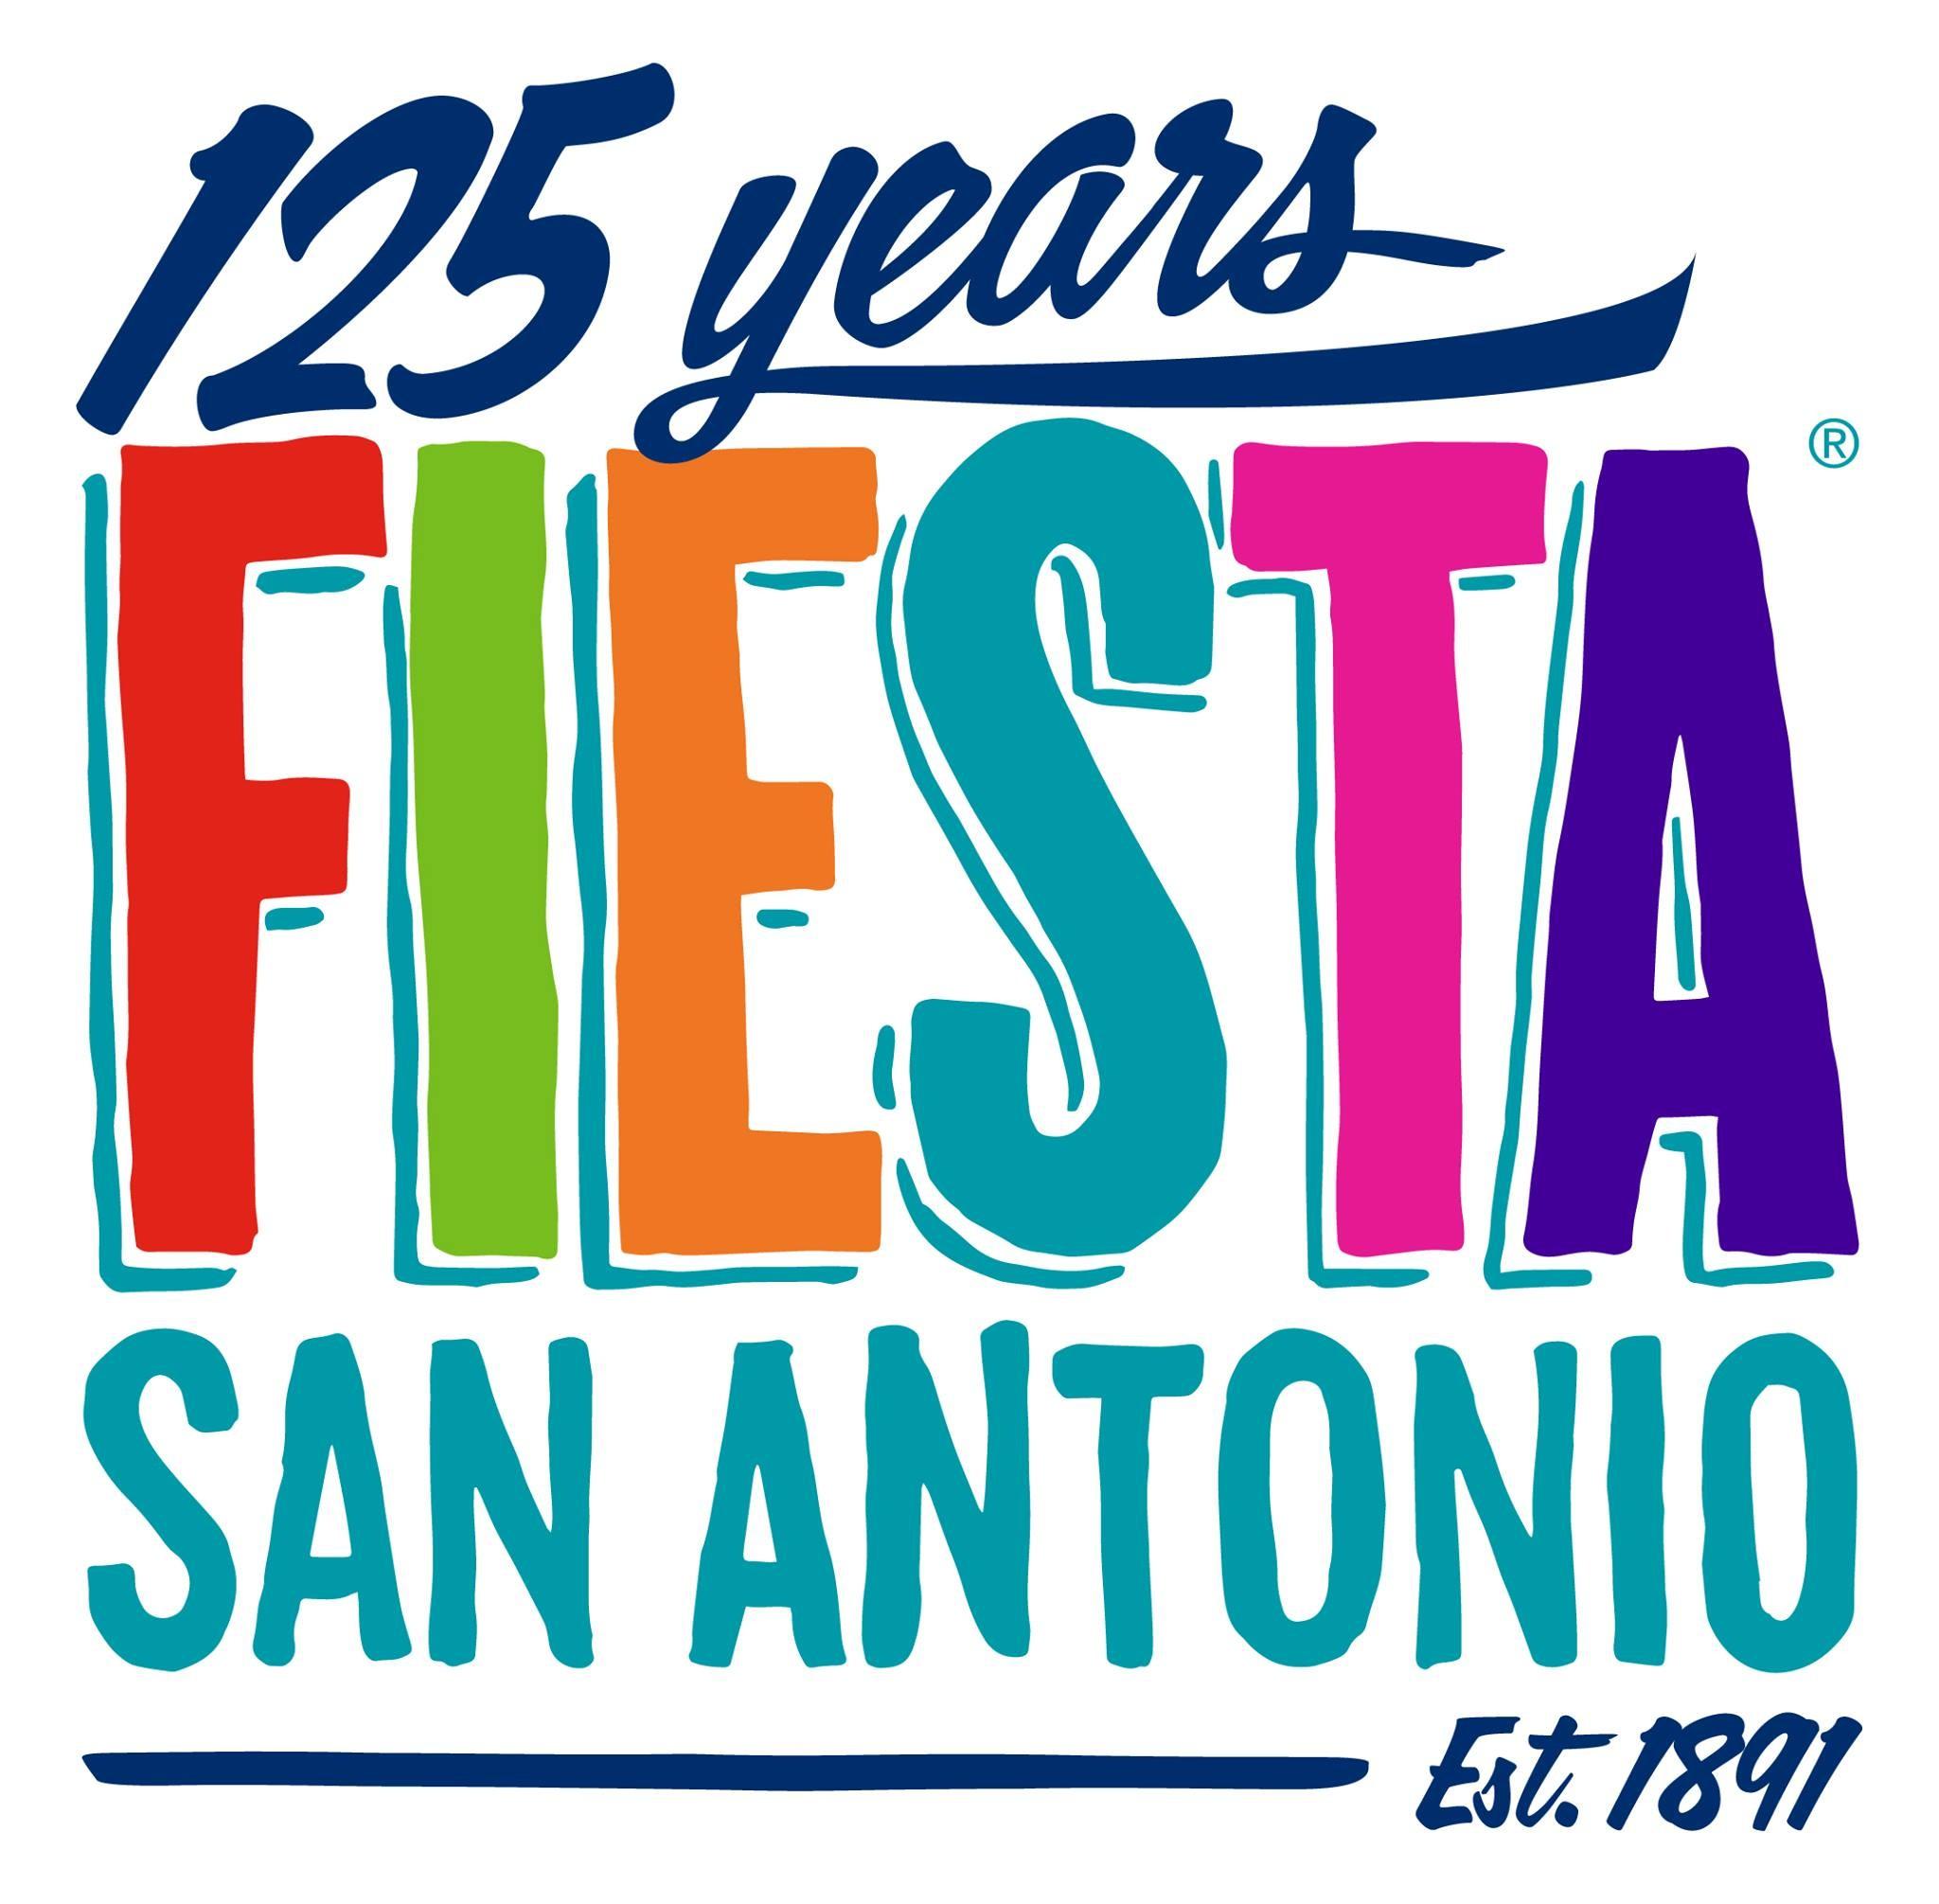 Enter Your Design For The Fiesta San Antonio Poster Contest